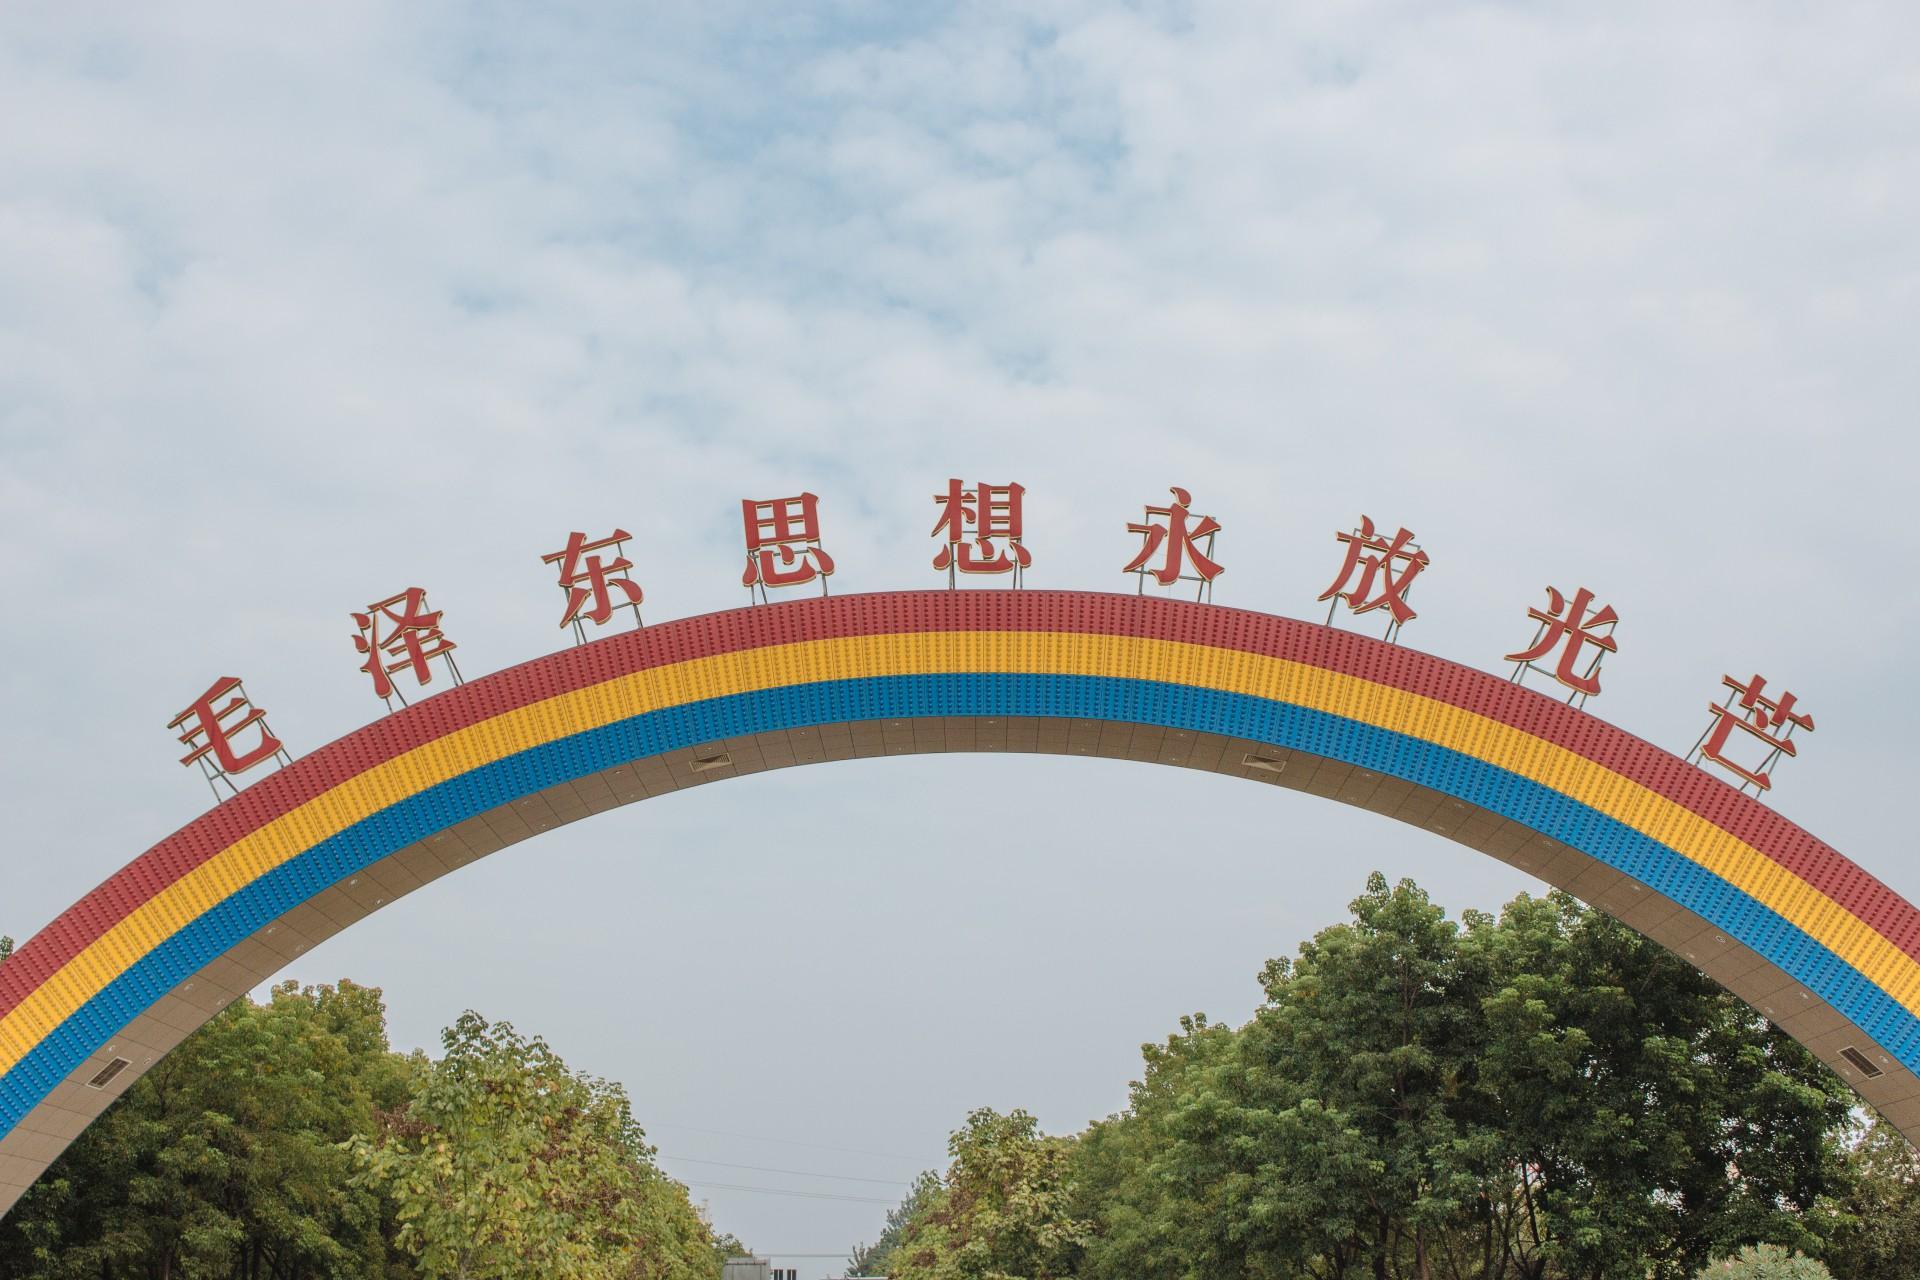 Linyou Xie Part 3: Them